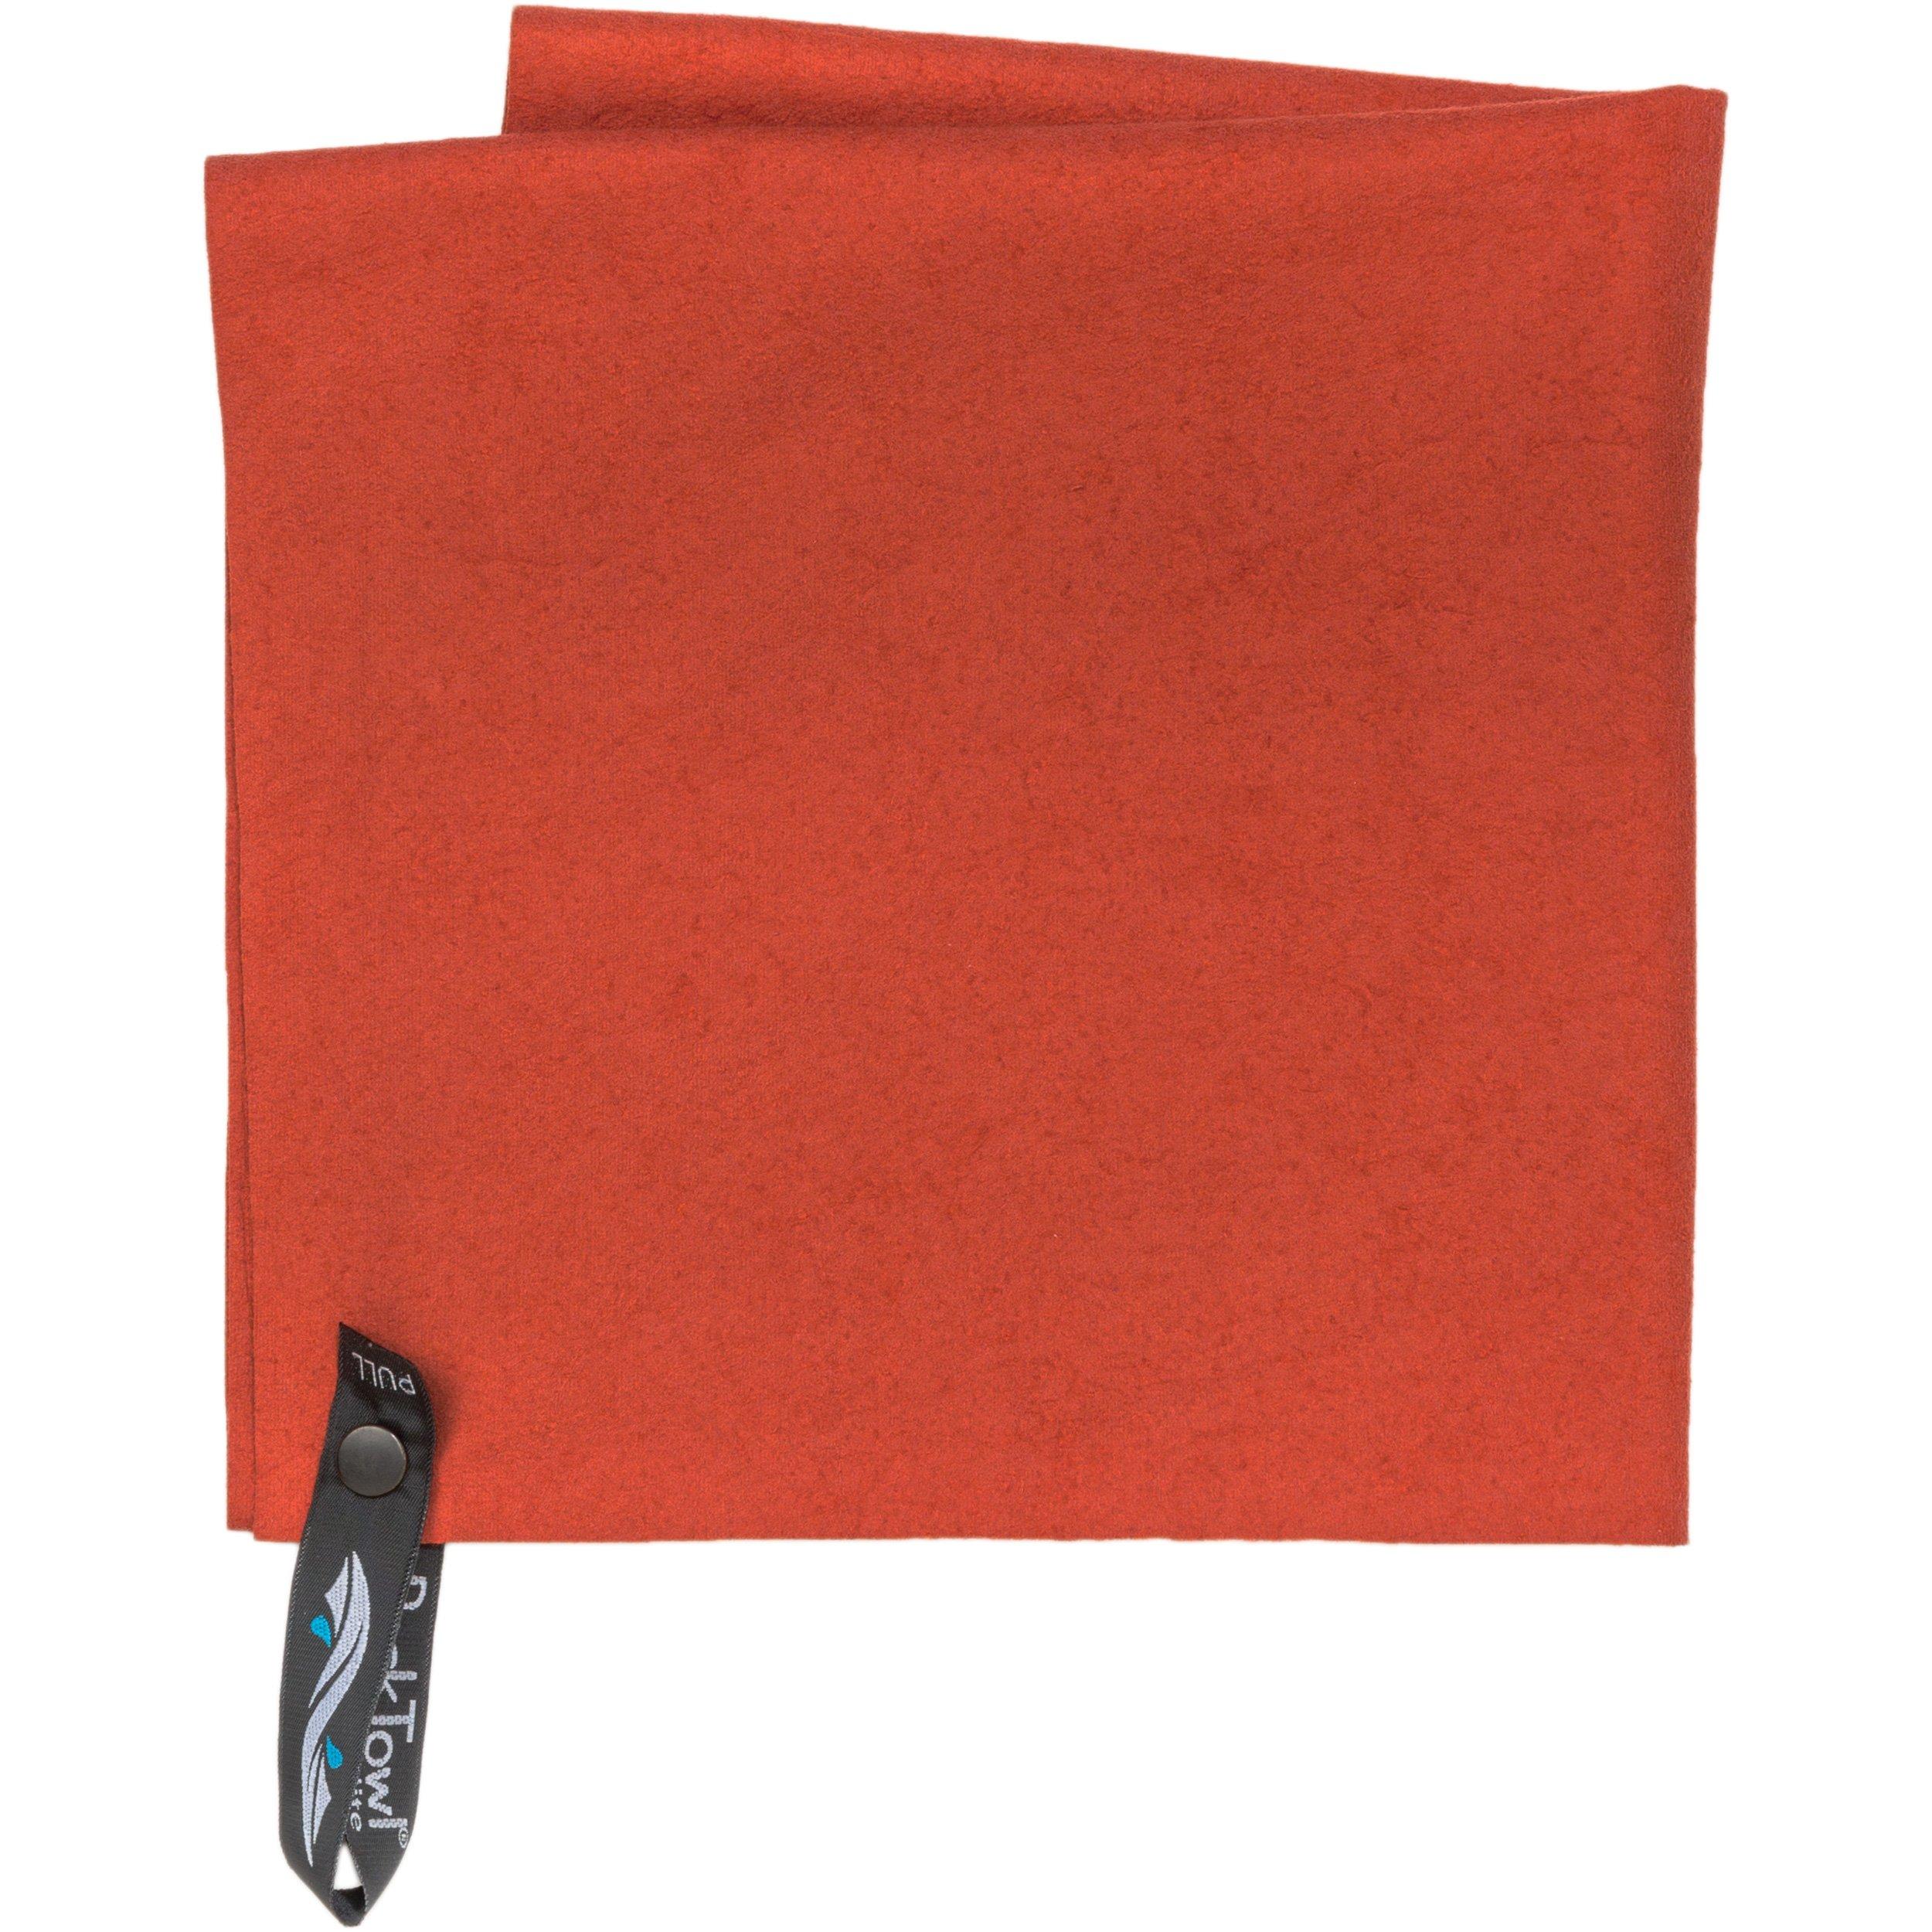 PackTowl UltraLite Microfiber Towel, Clay, Beach- 36 x 59-Inch